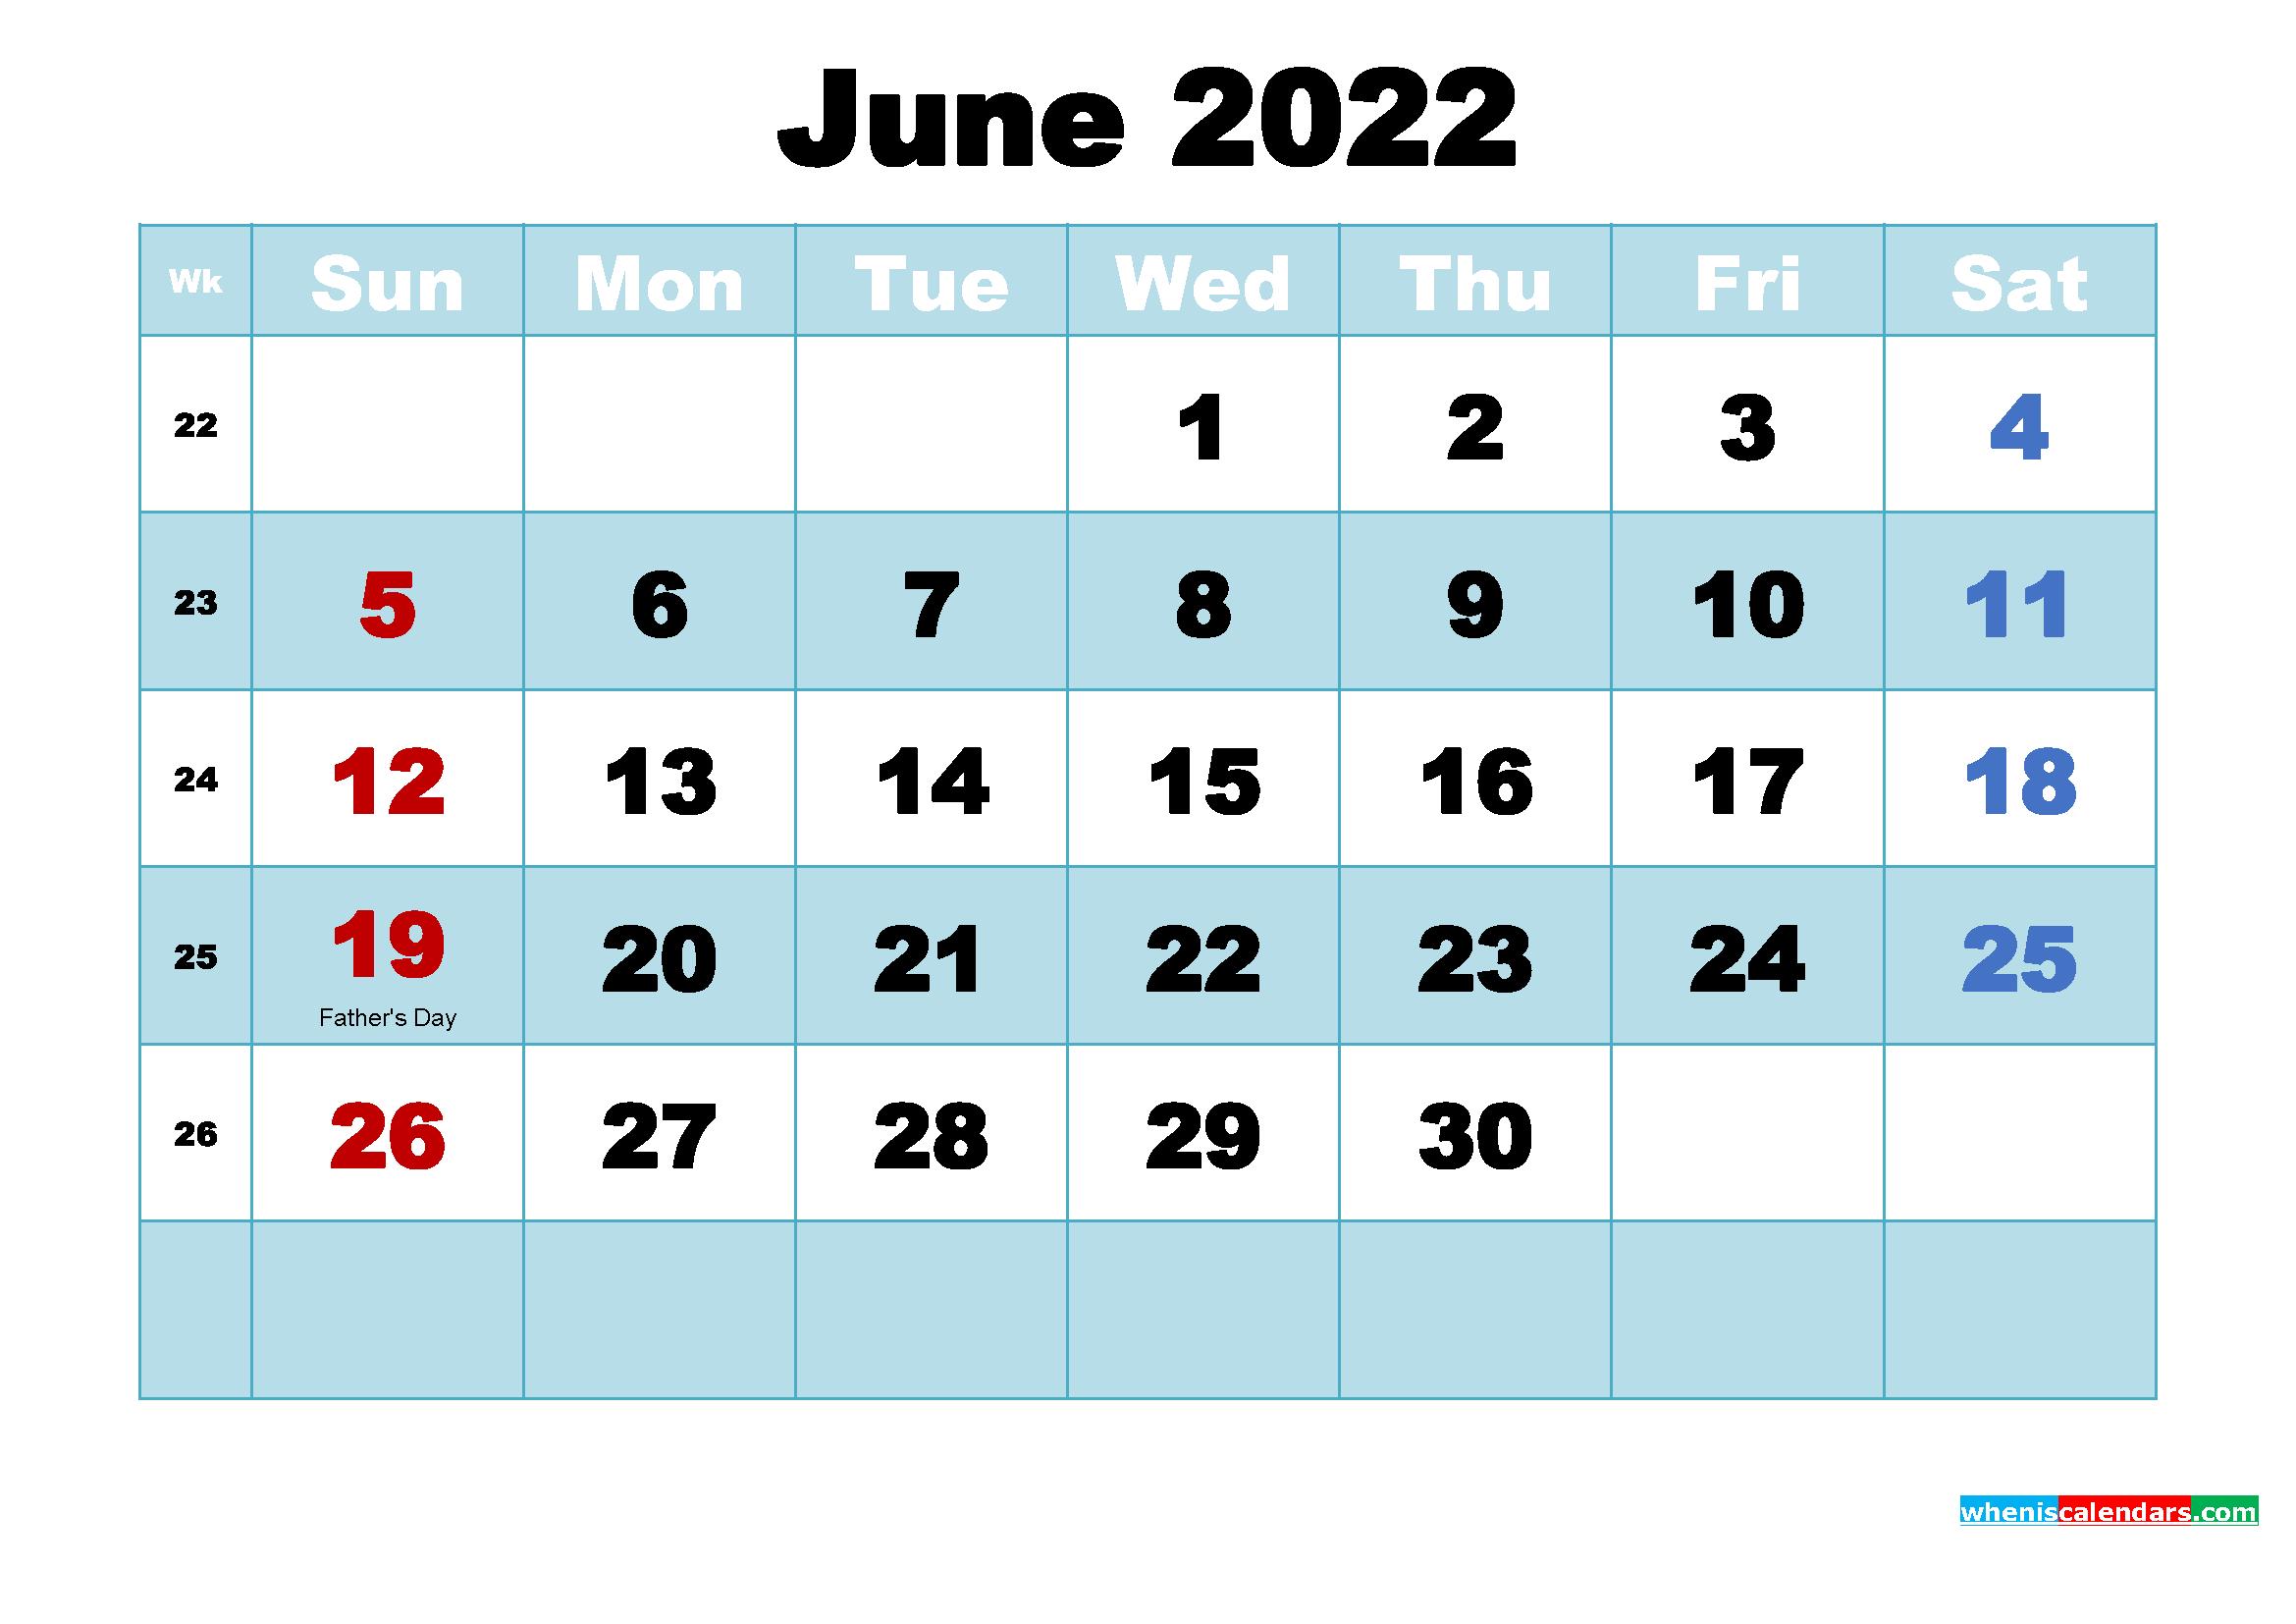 June 2022 Desktop Calendar with Holidays